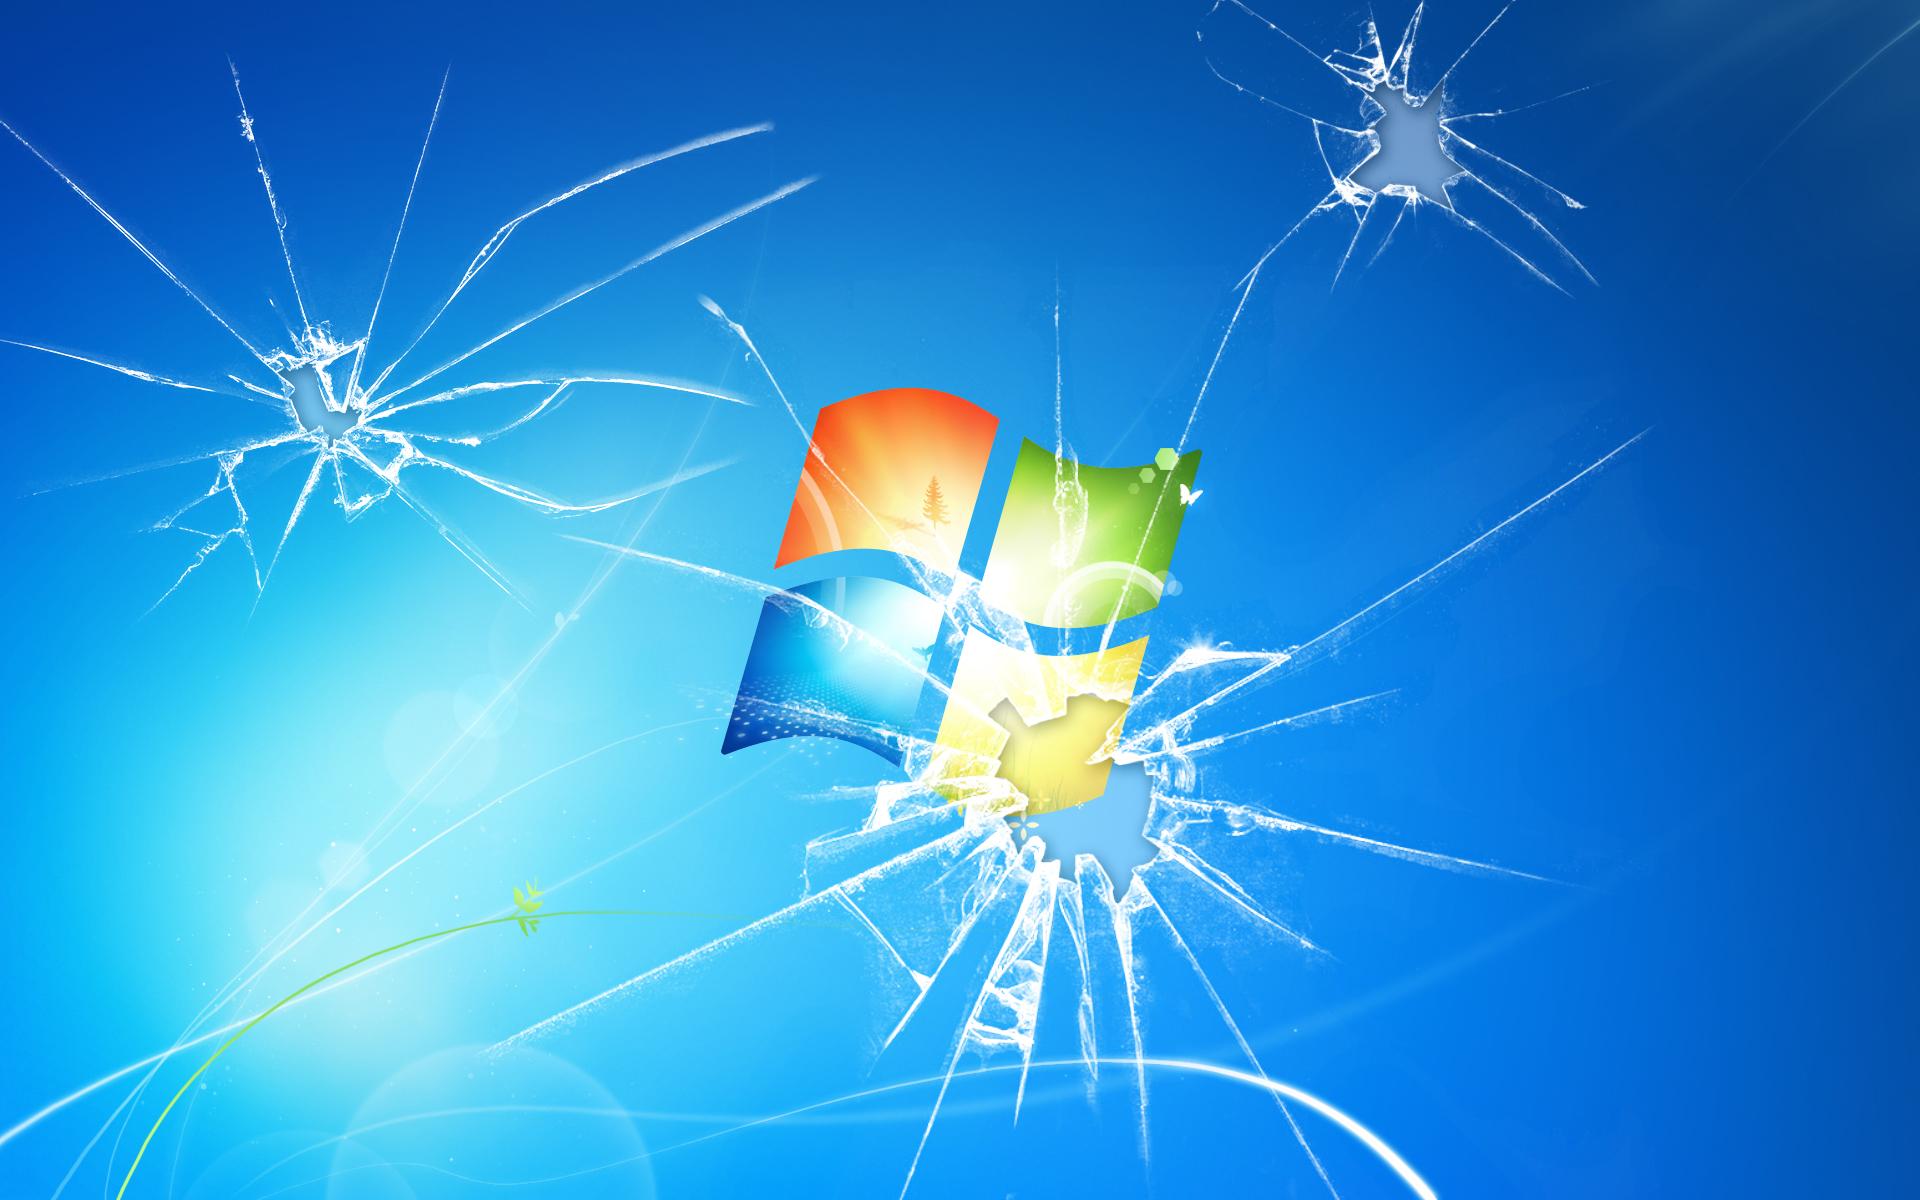 Broken Screen Wallpaper 1920x1200 Broken Screen Microsoft Windows 1920x1200